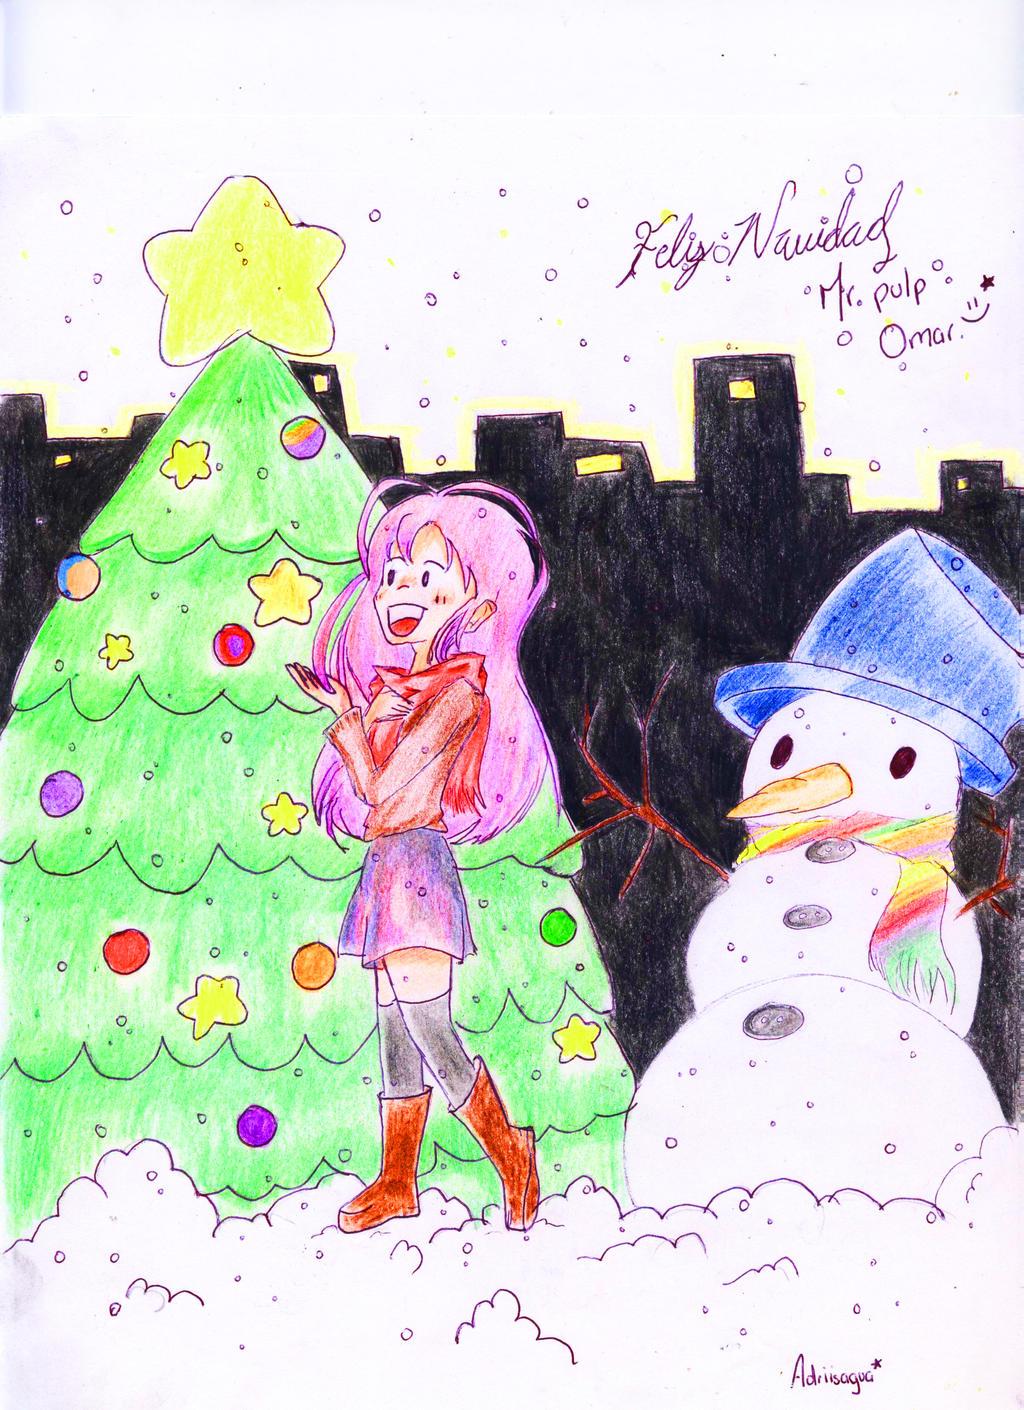 Morita Star Xmas by mrpulp-presenta